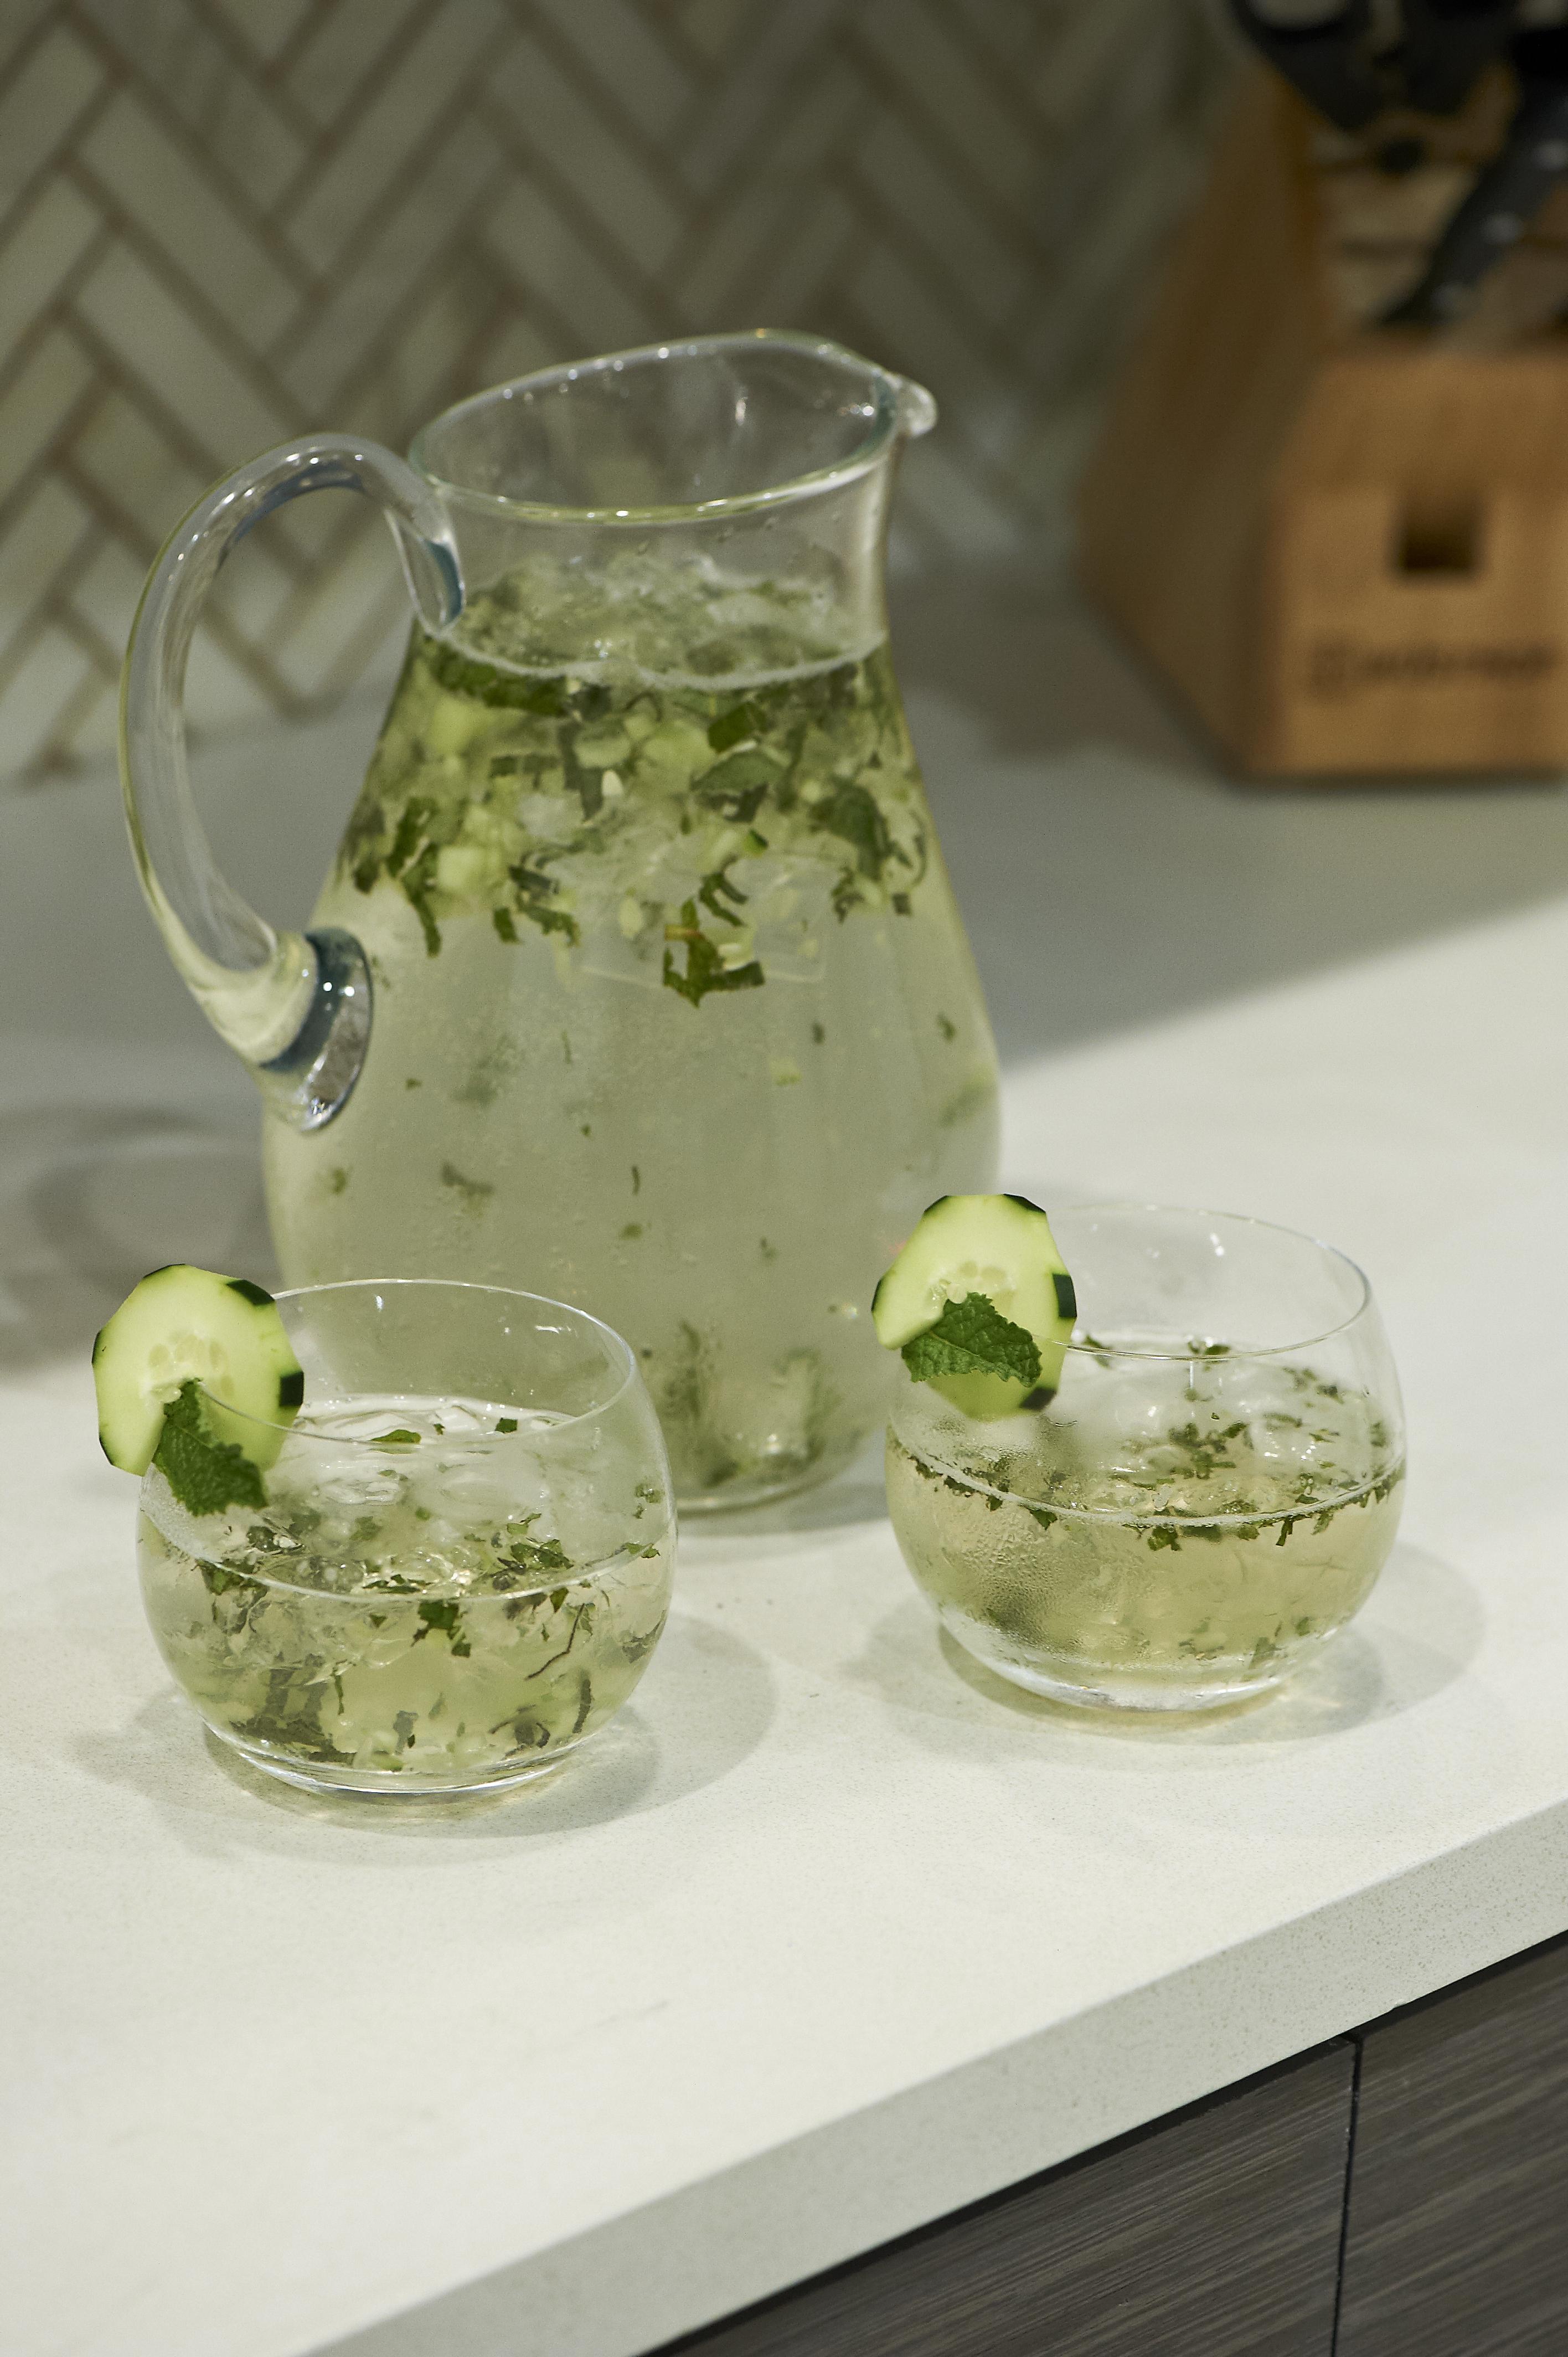 Summertime Zephyr Garden Cocktail {Plus Electrolux Sweepstakes}